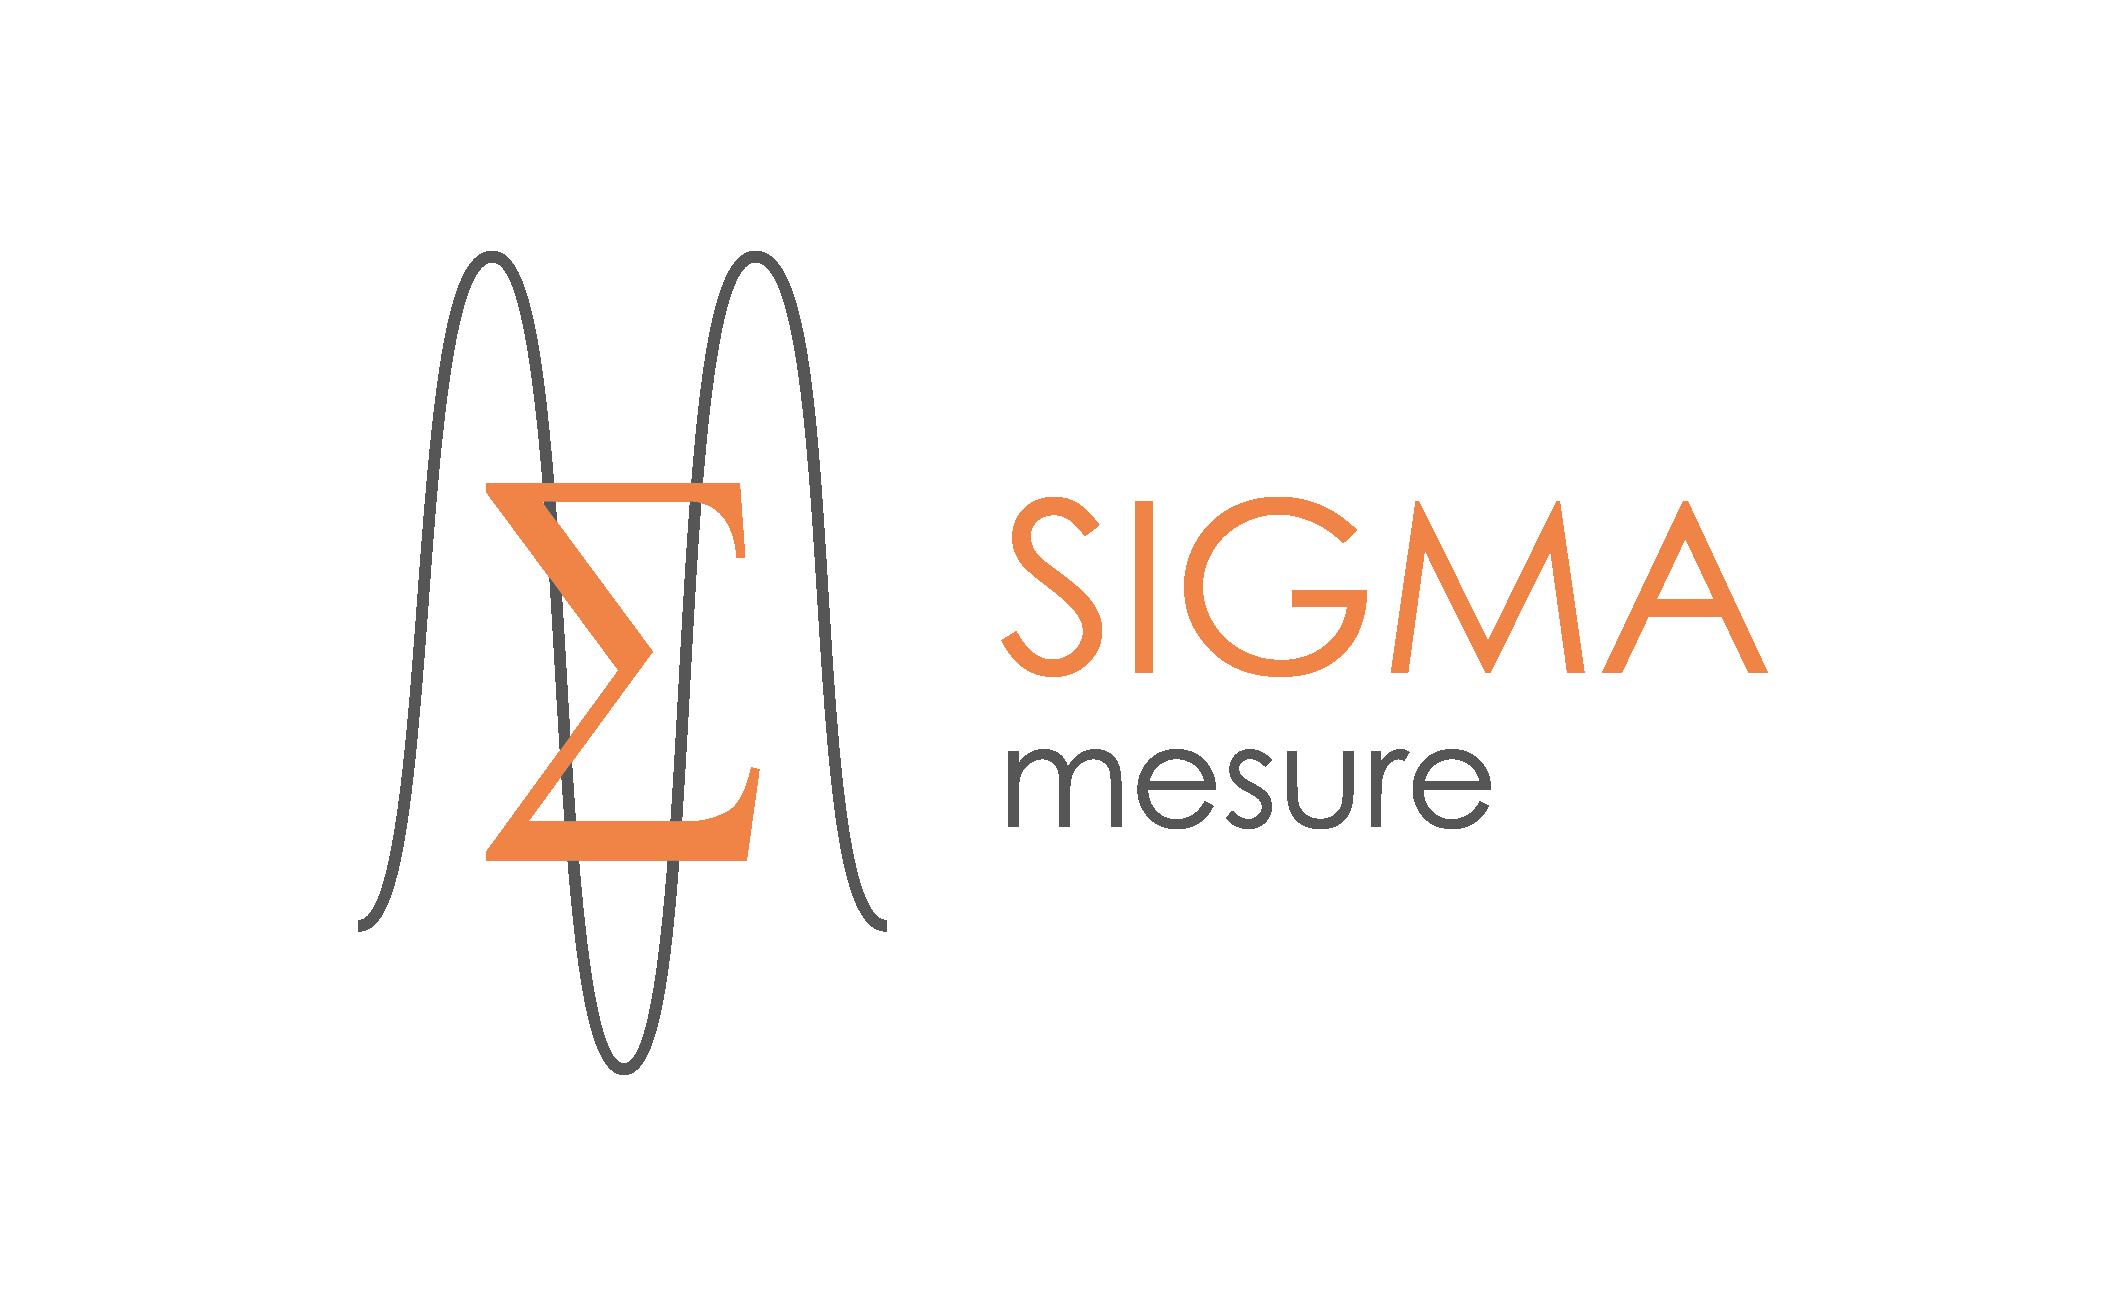 1548255040-sigma-mesure.png